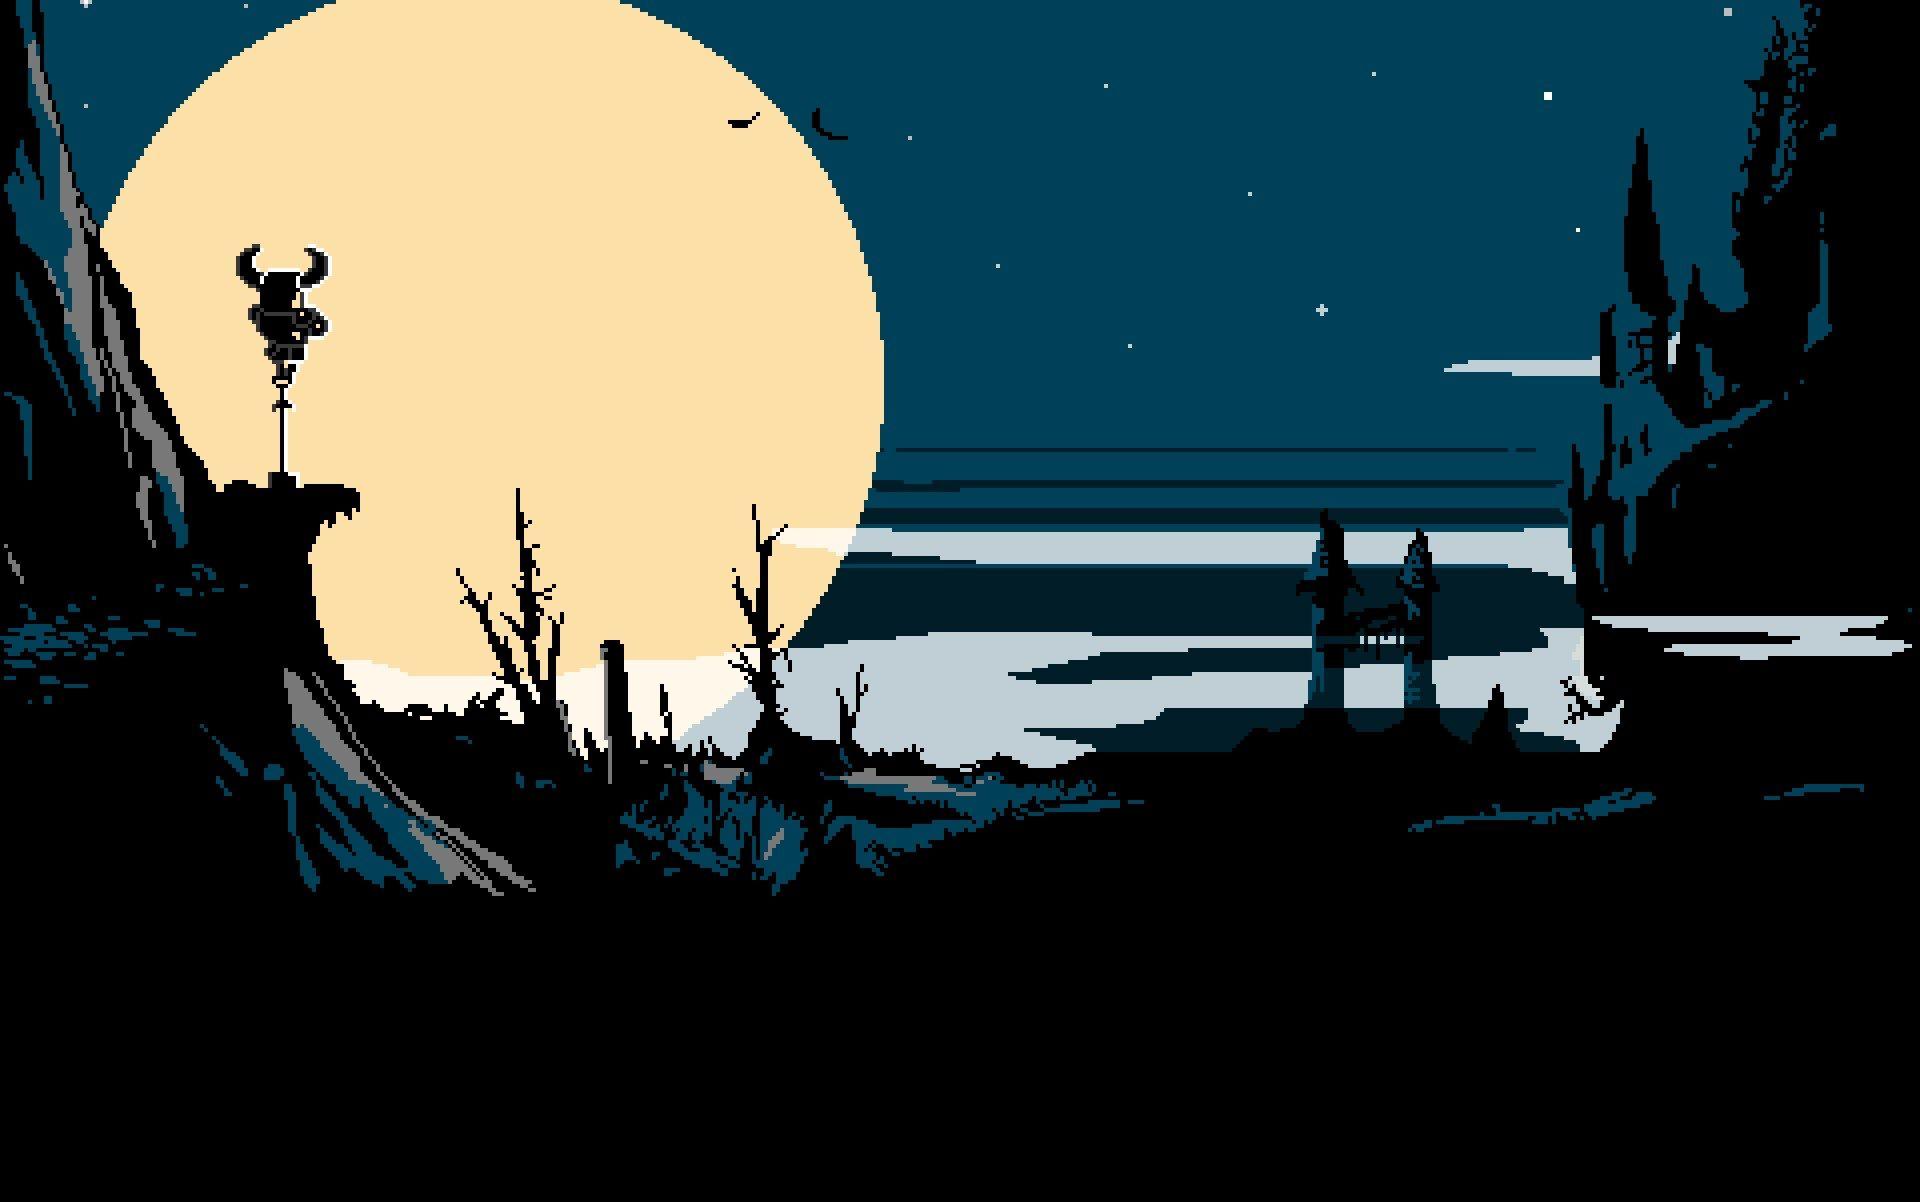 Free Wallpaper And Screensavers For Shovel Knight Pixel Art Shovel Knight Night Painting